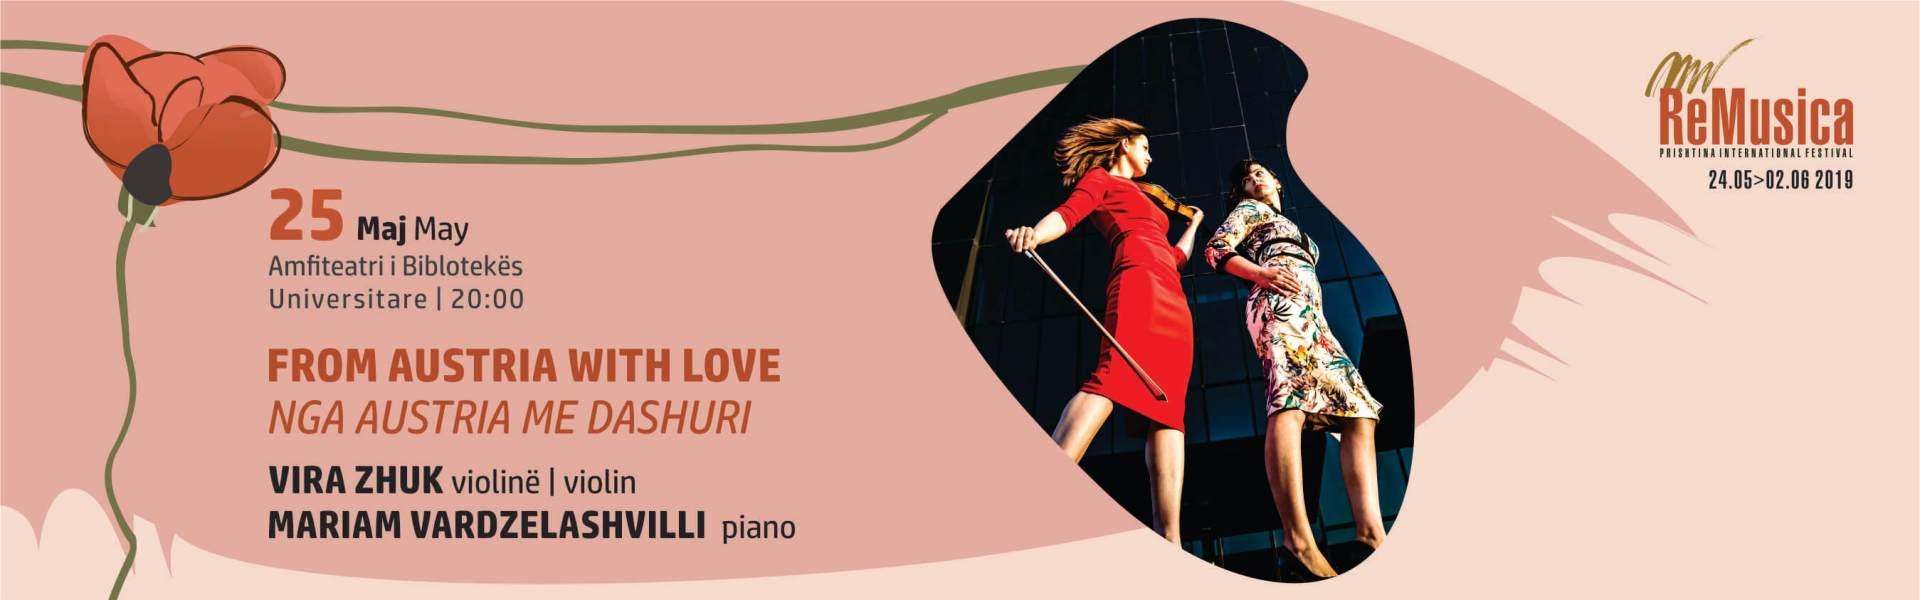 FROM AUSTRIA WITH LOVE | NGA AUSTRIA ME DASHURI – VM DUO